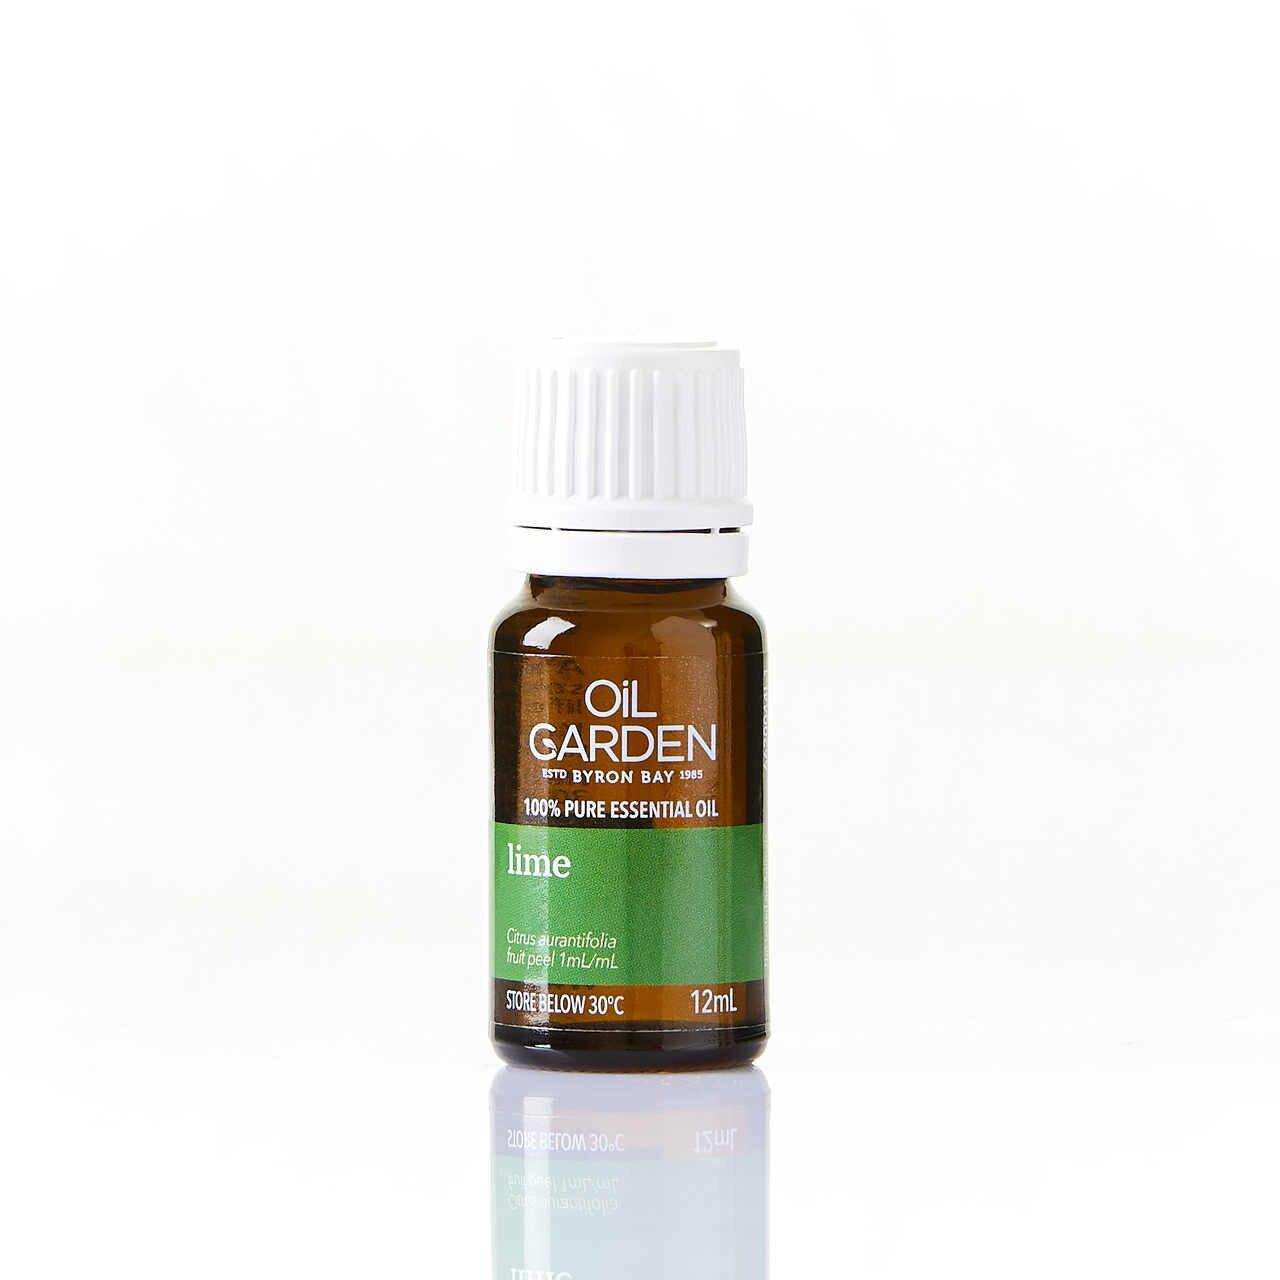 Oil Garden Lime Pure Essential Oil 12mL 6620044